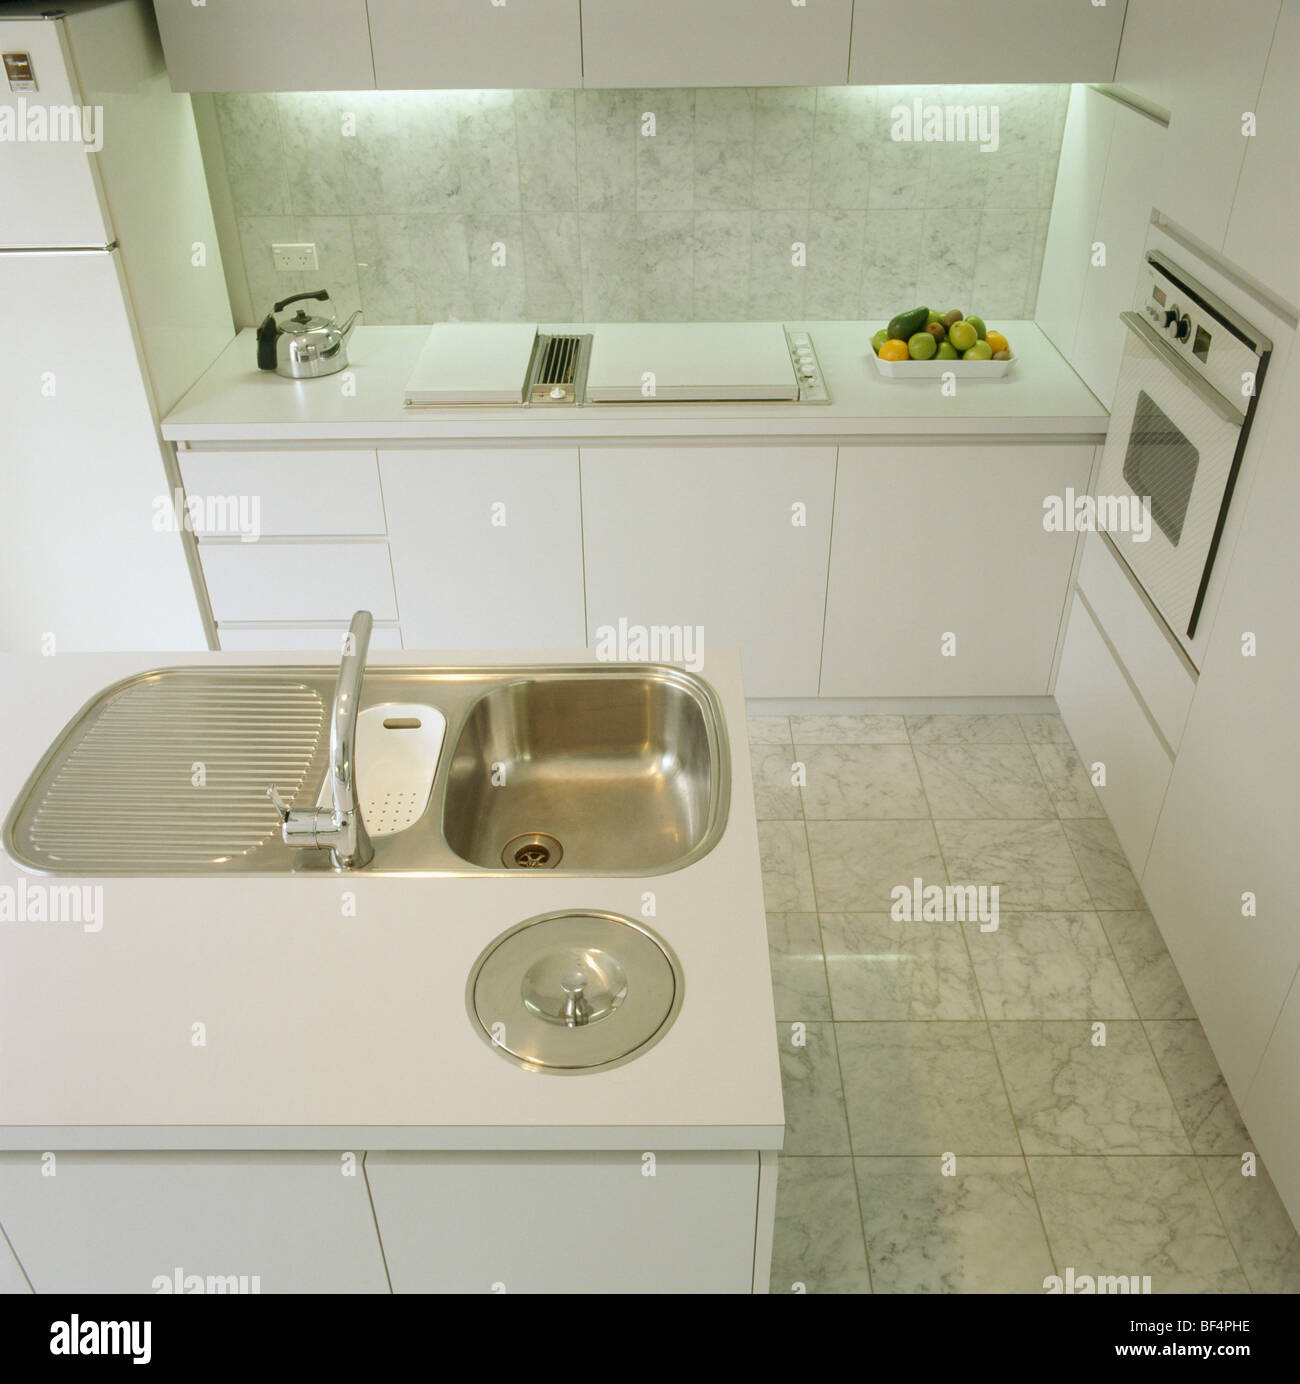 Sink In Island Unit White Stock Photos & Sink In Island